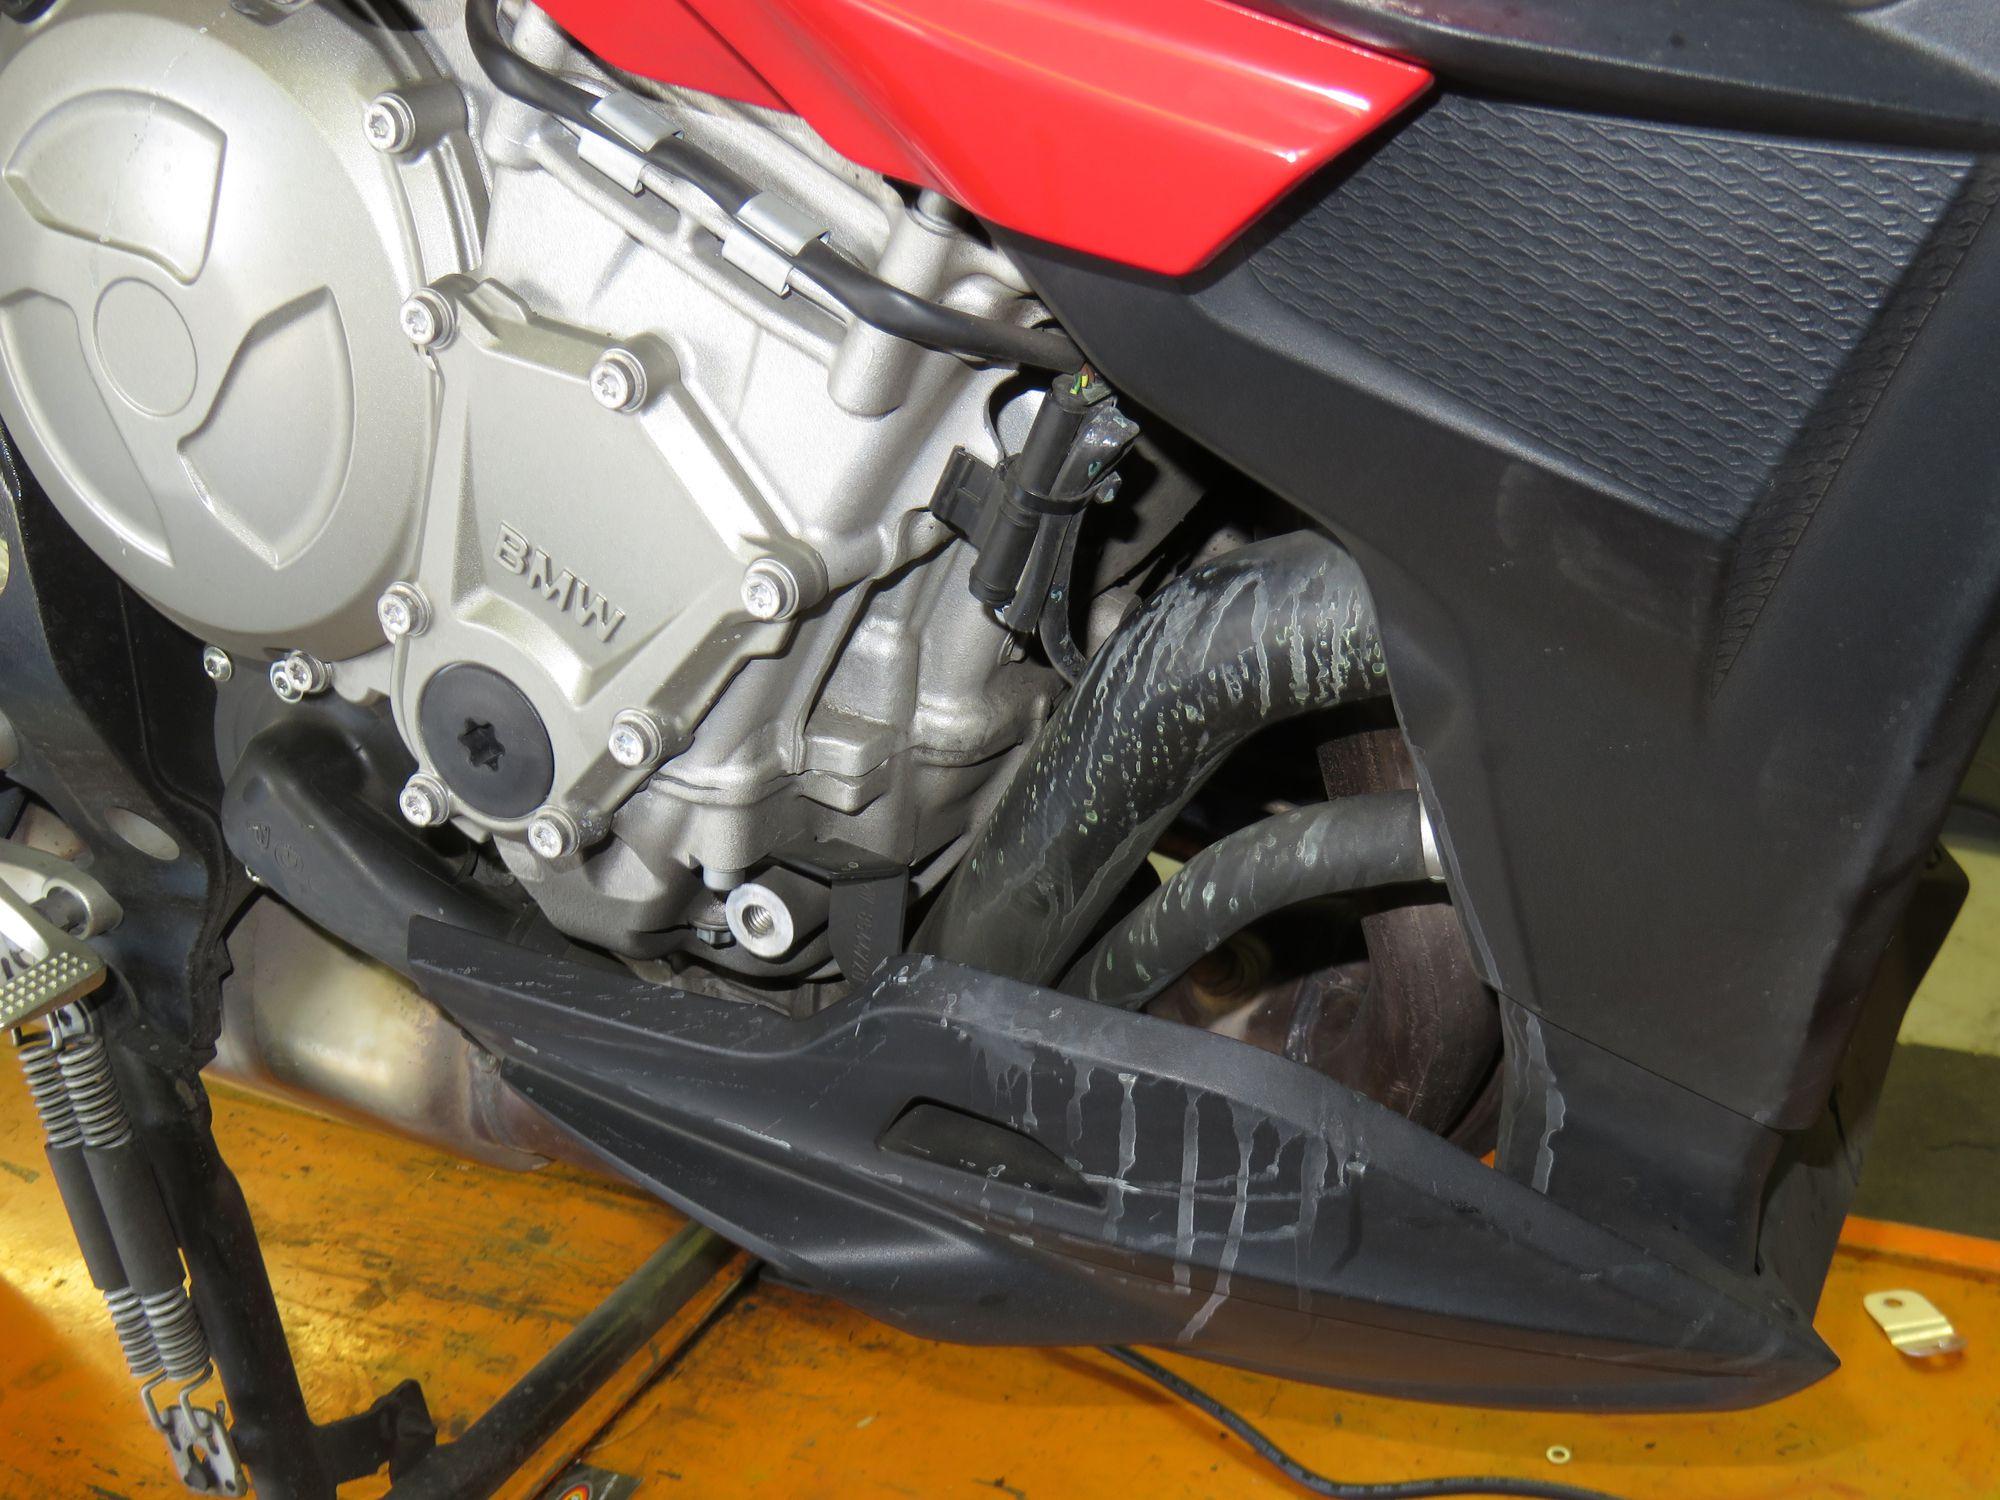 BMW S1000XR Maintenance | Motorcyclist